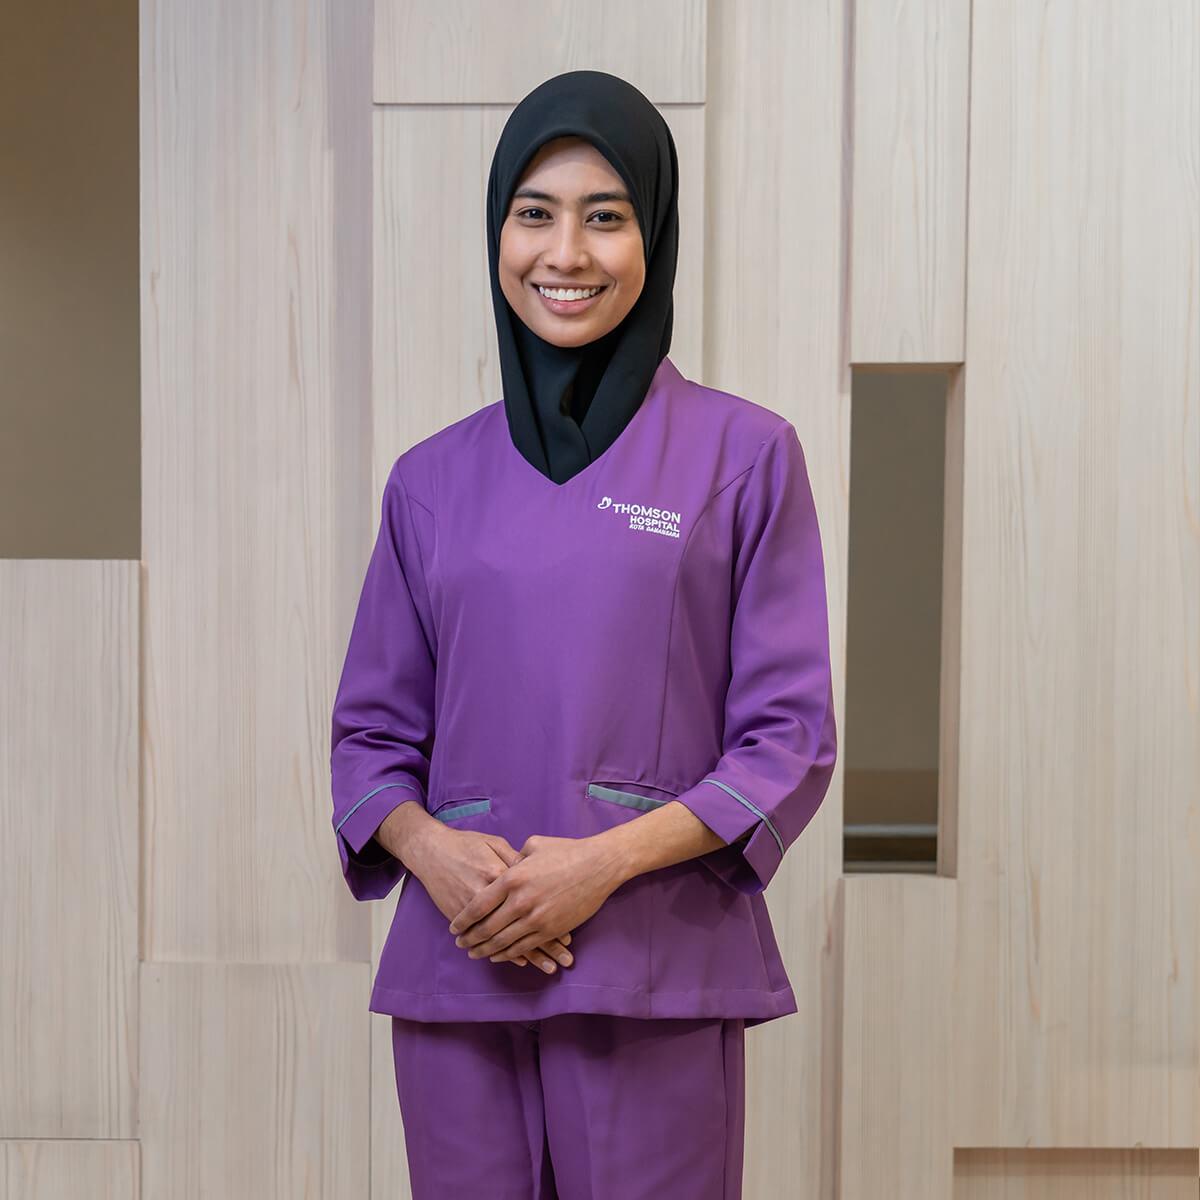 Career as Nurse at Thomson Hospital